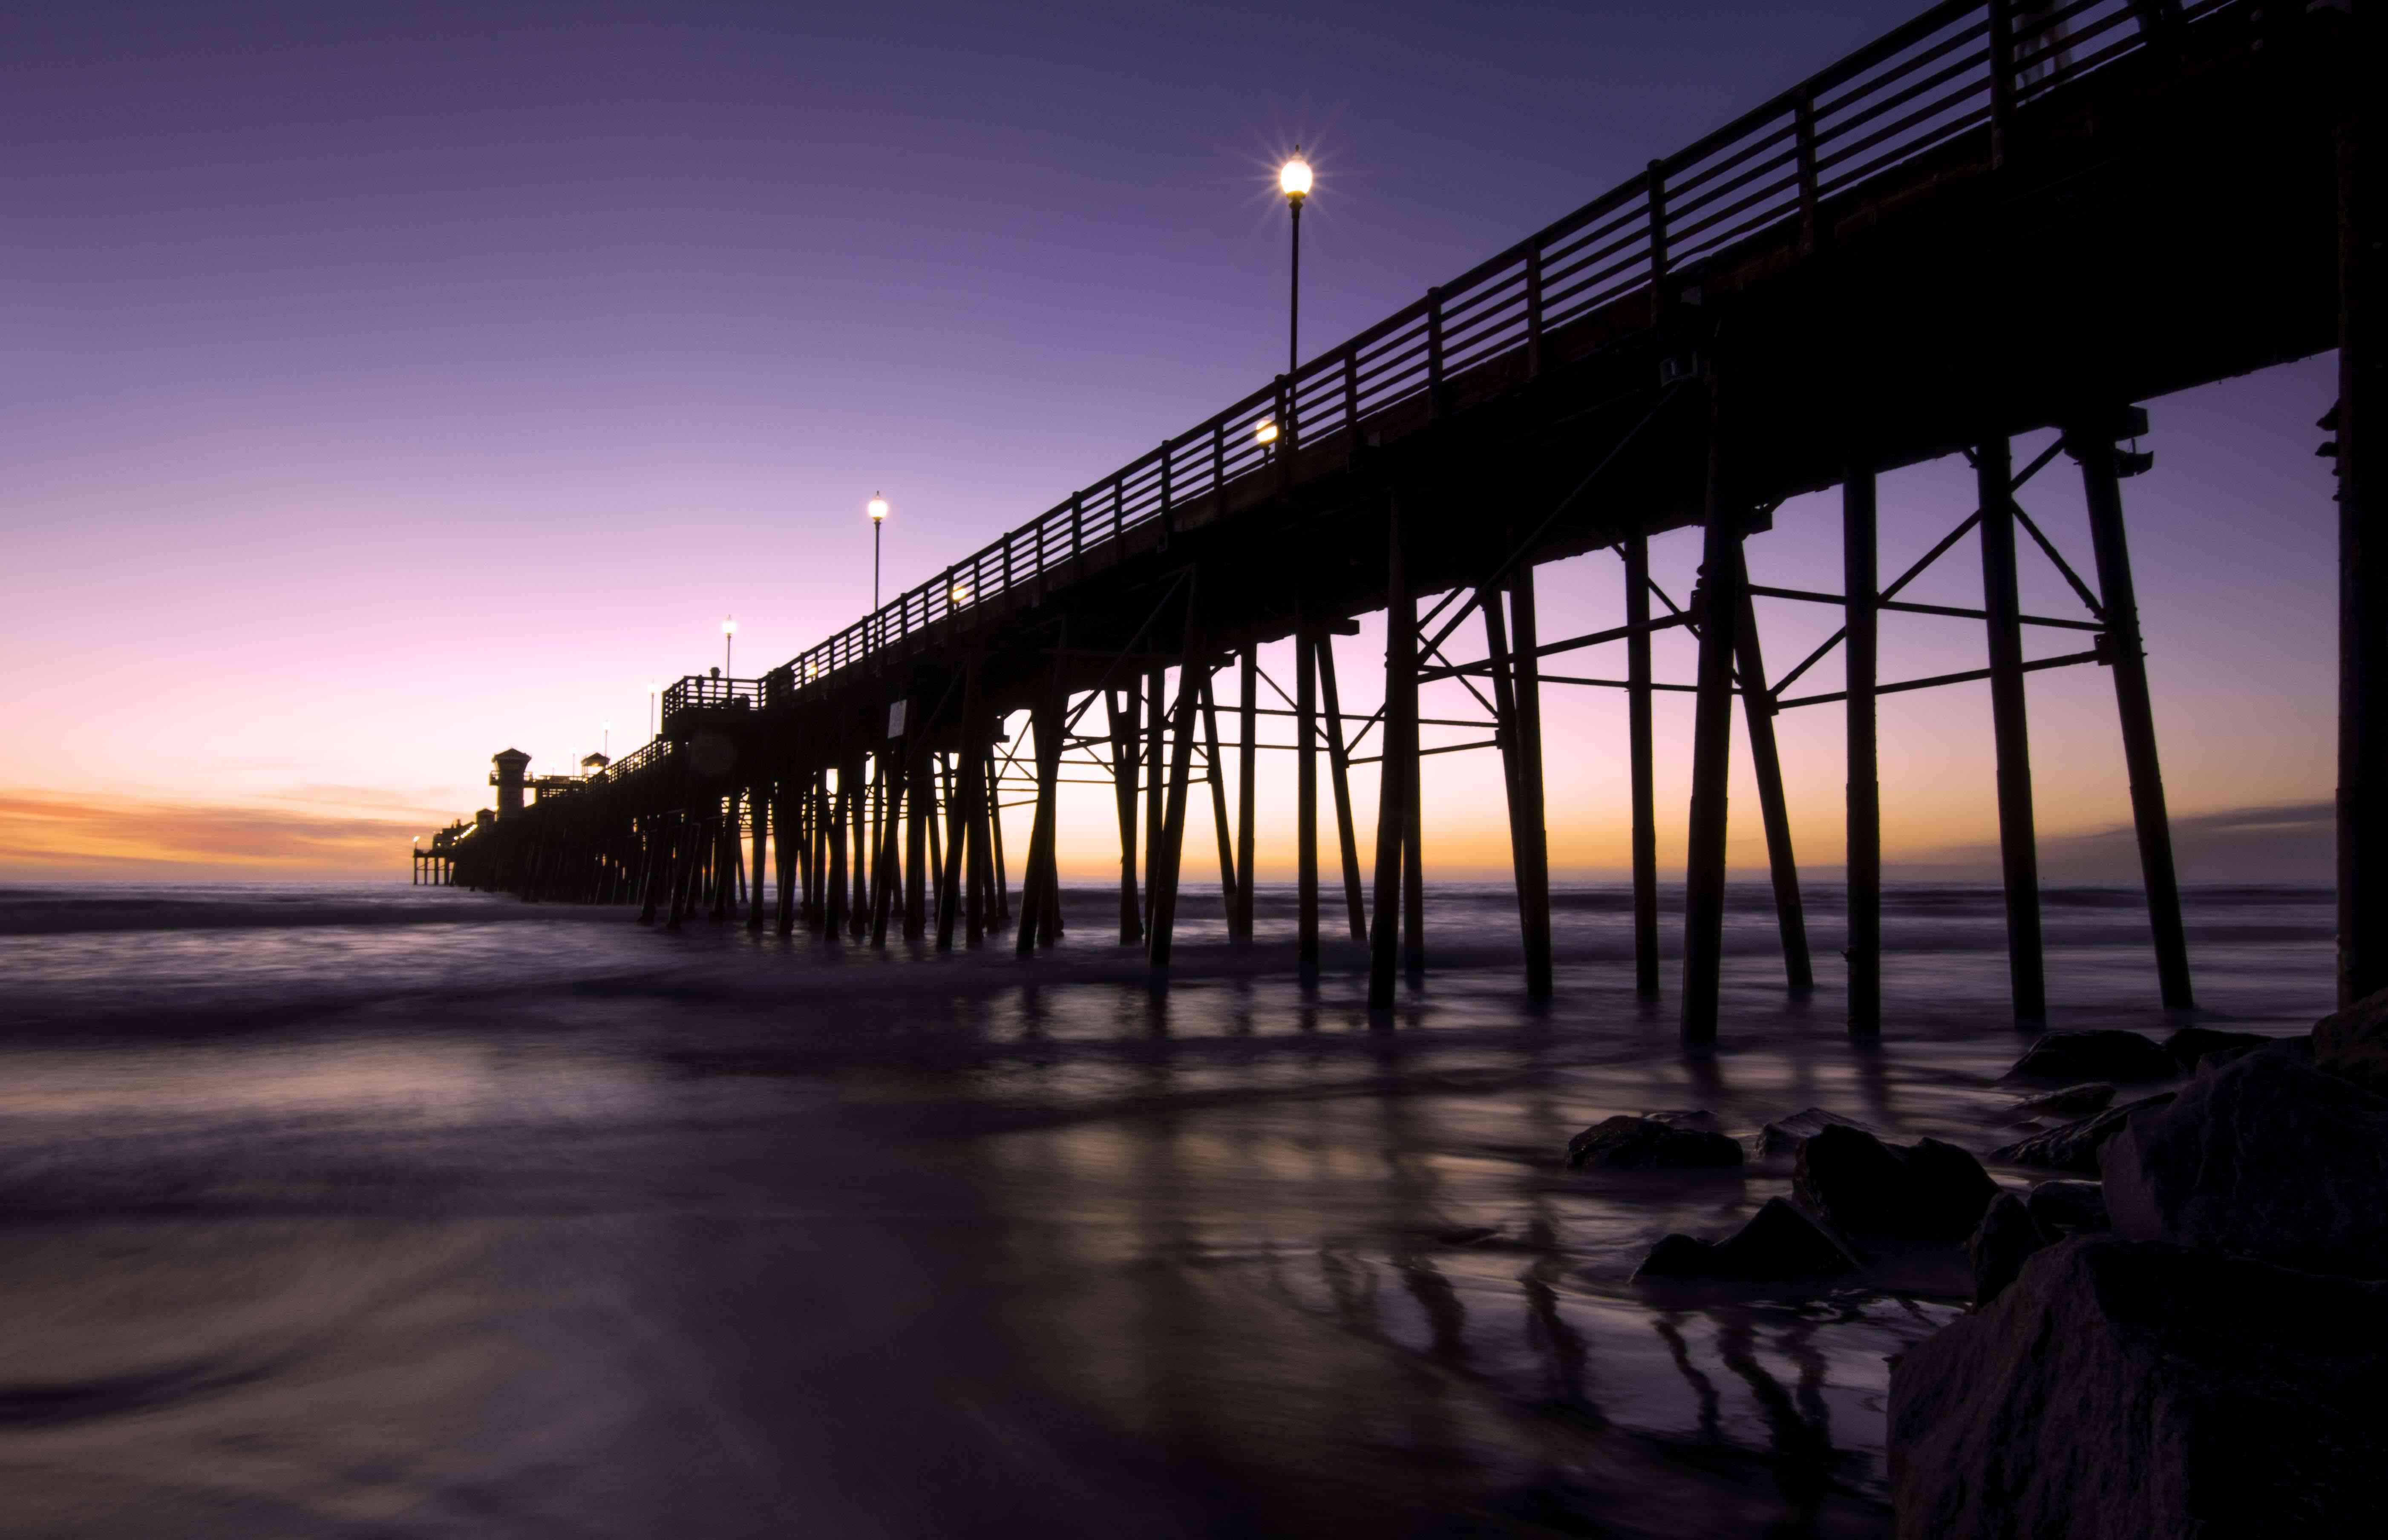 The pier in Oceanside, California at nigh